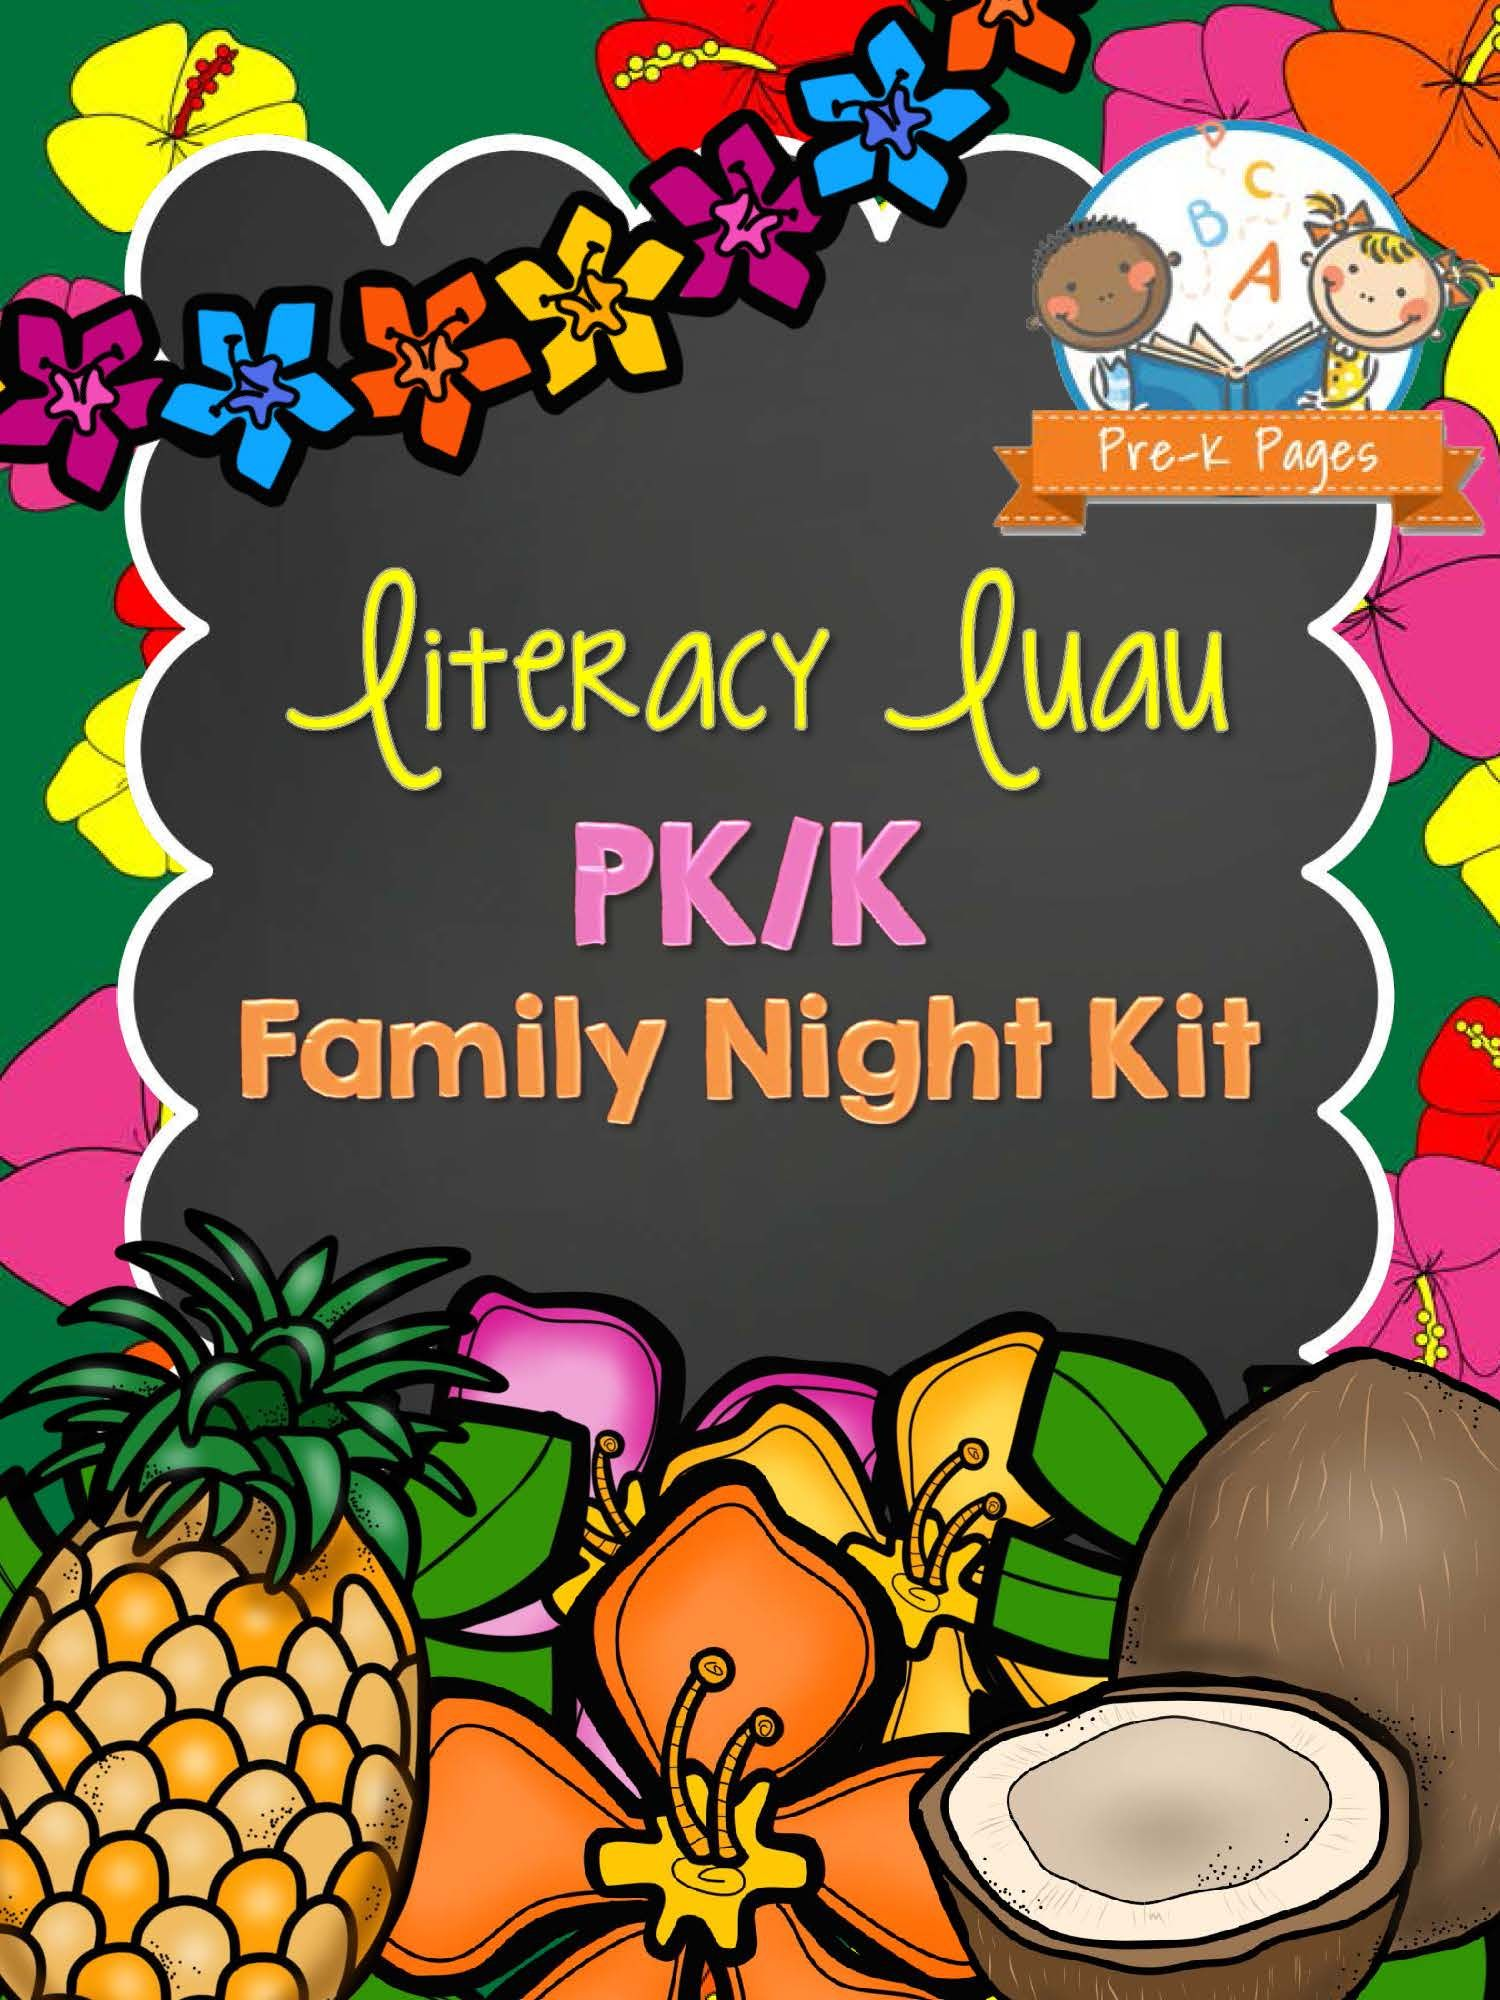 Family Literacy Night Kit